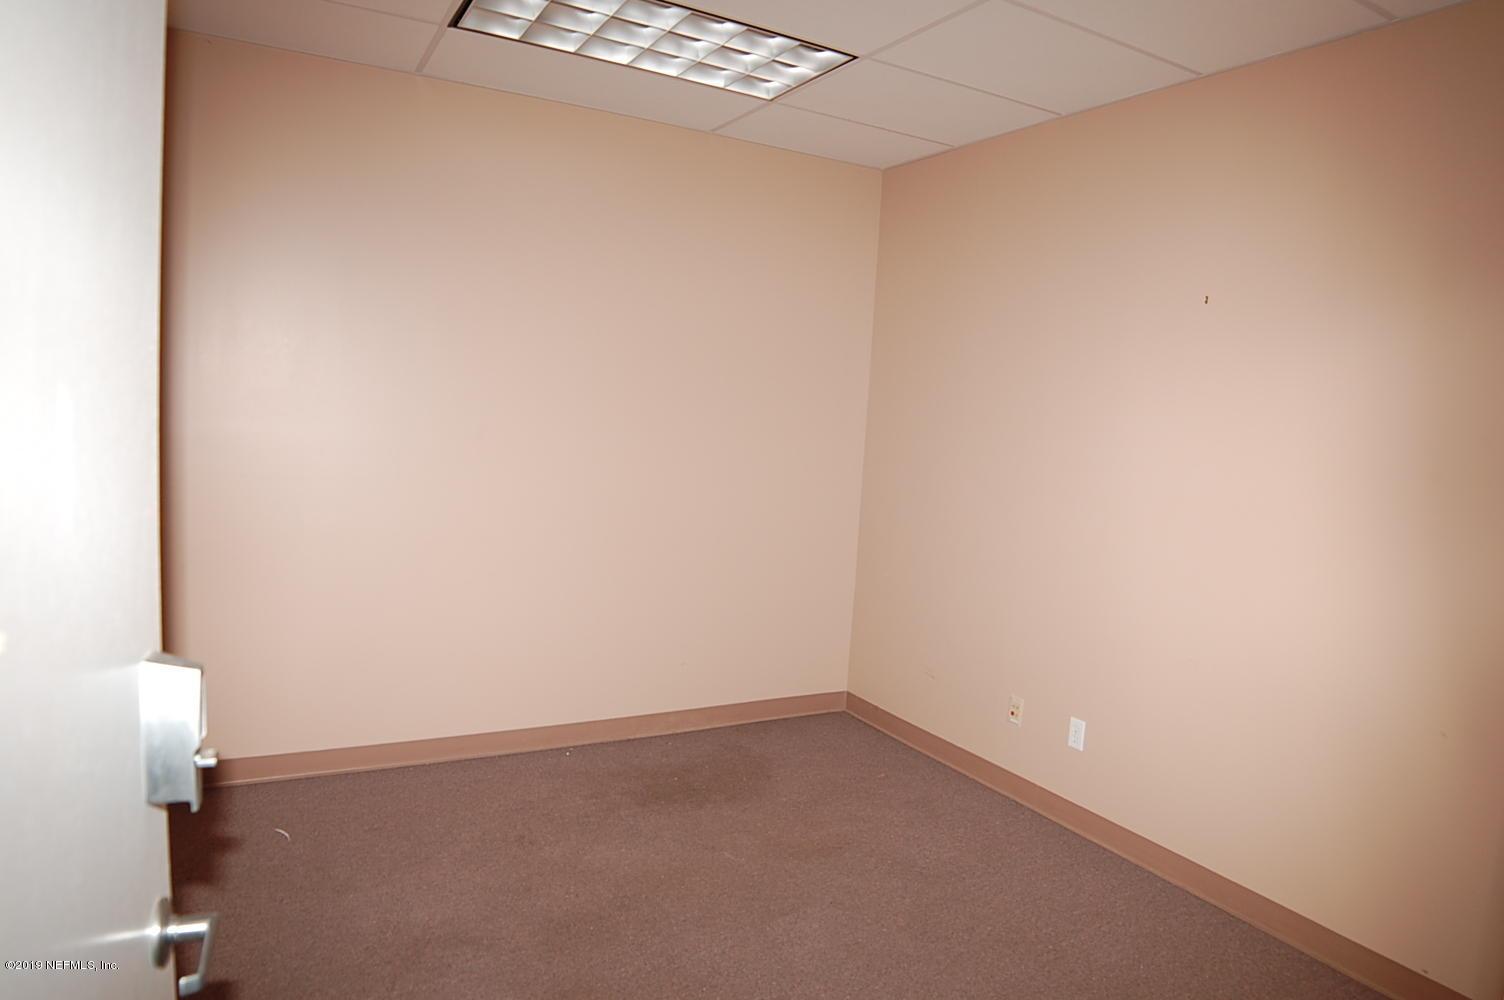 6973 HIGHWAY, JACKSONVILLE, FLORIDA 32254, ,Commercial,For sale,HIGHWAY,1061138